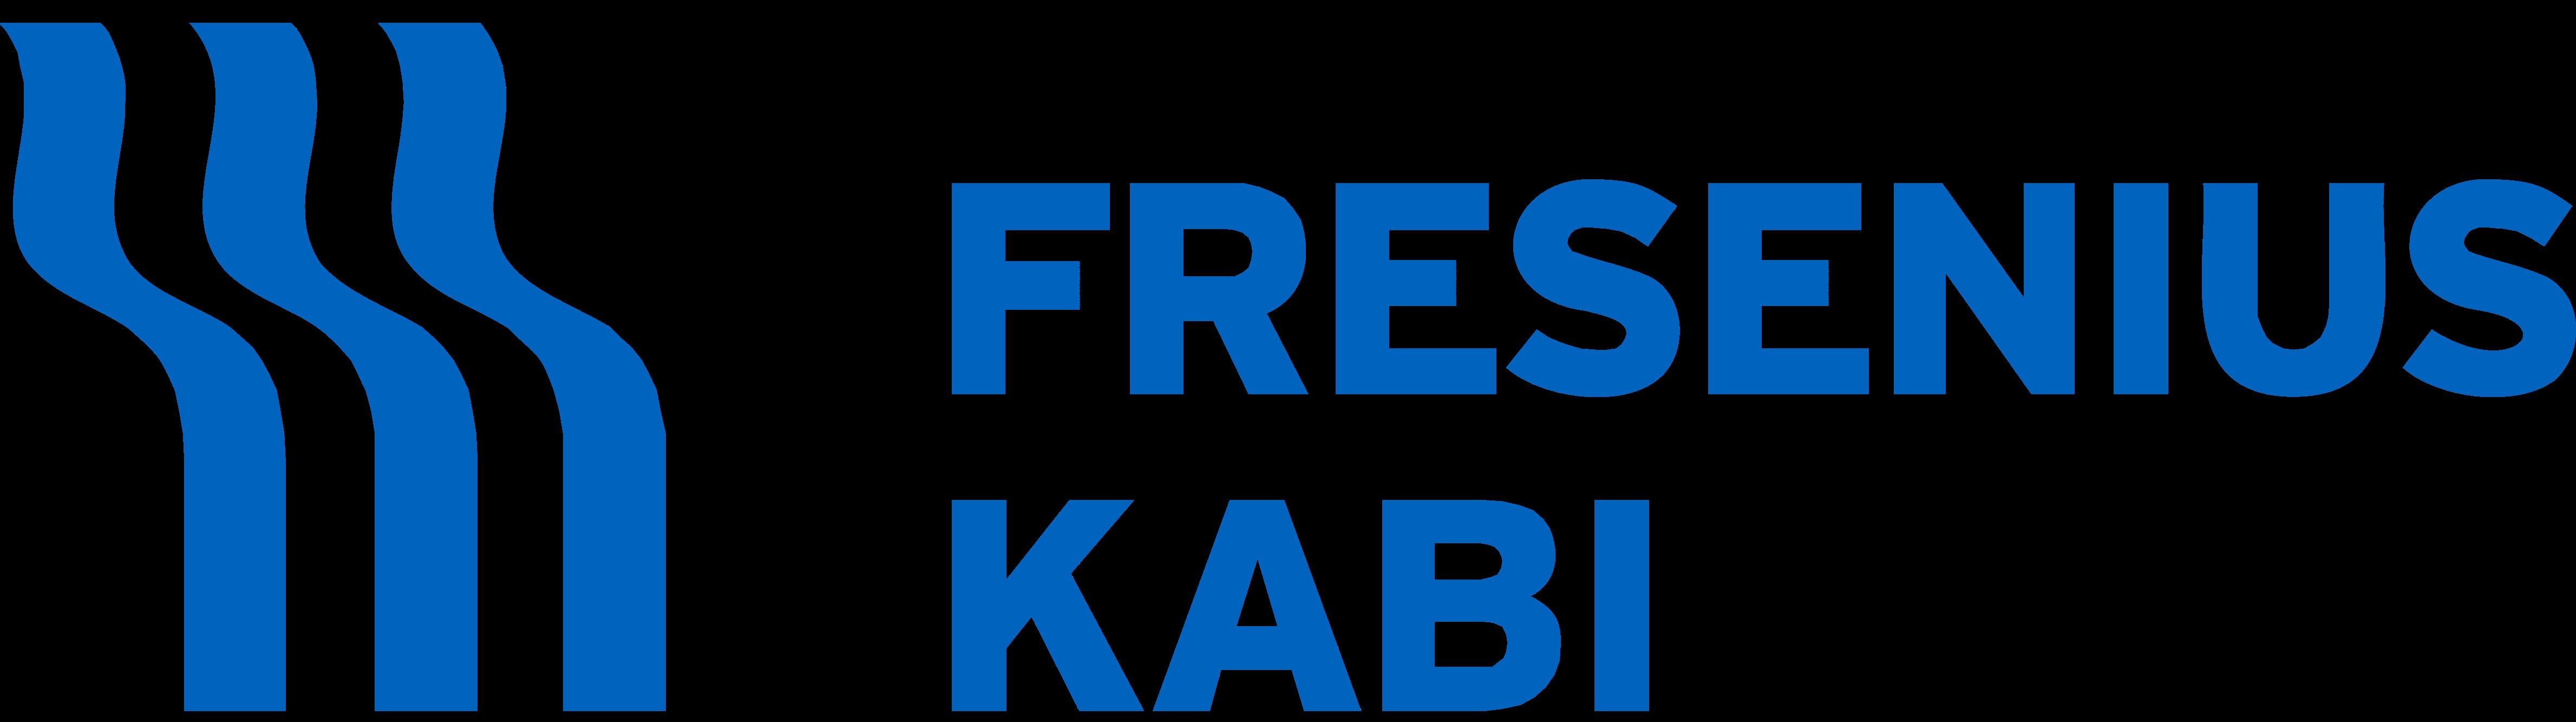 Fresenius Kabi Oncology - Fresenius, Transparent background PNG HD thumbnail